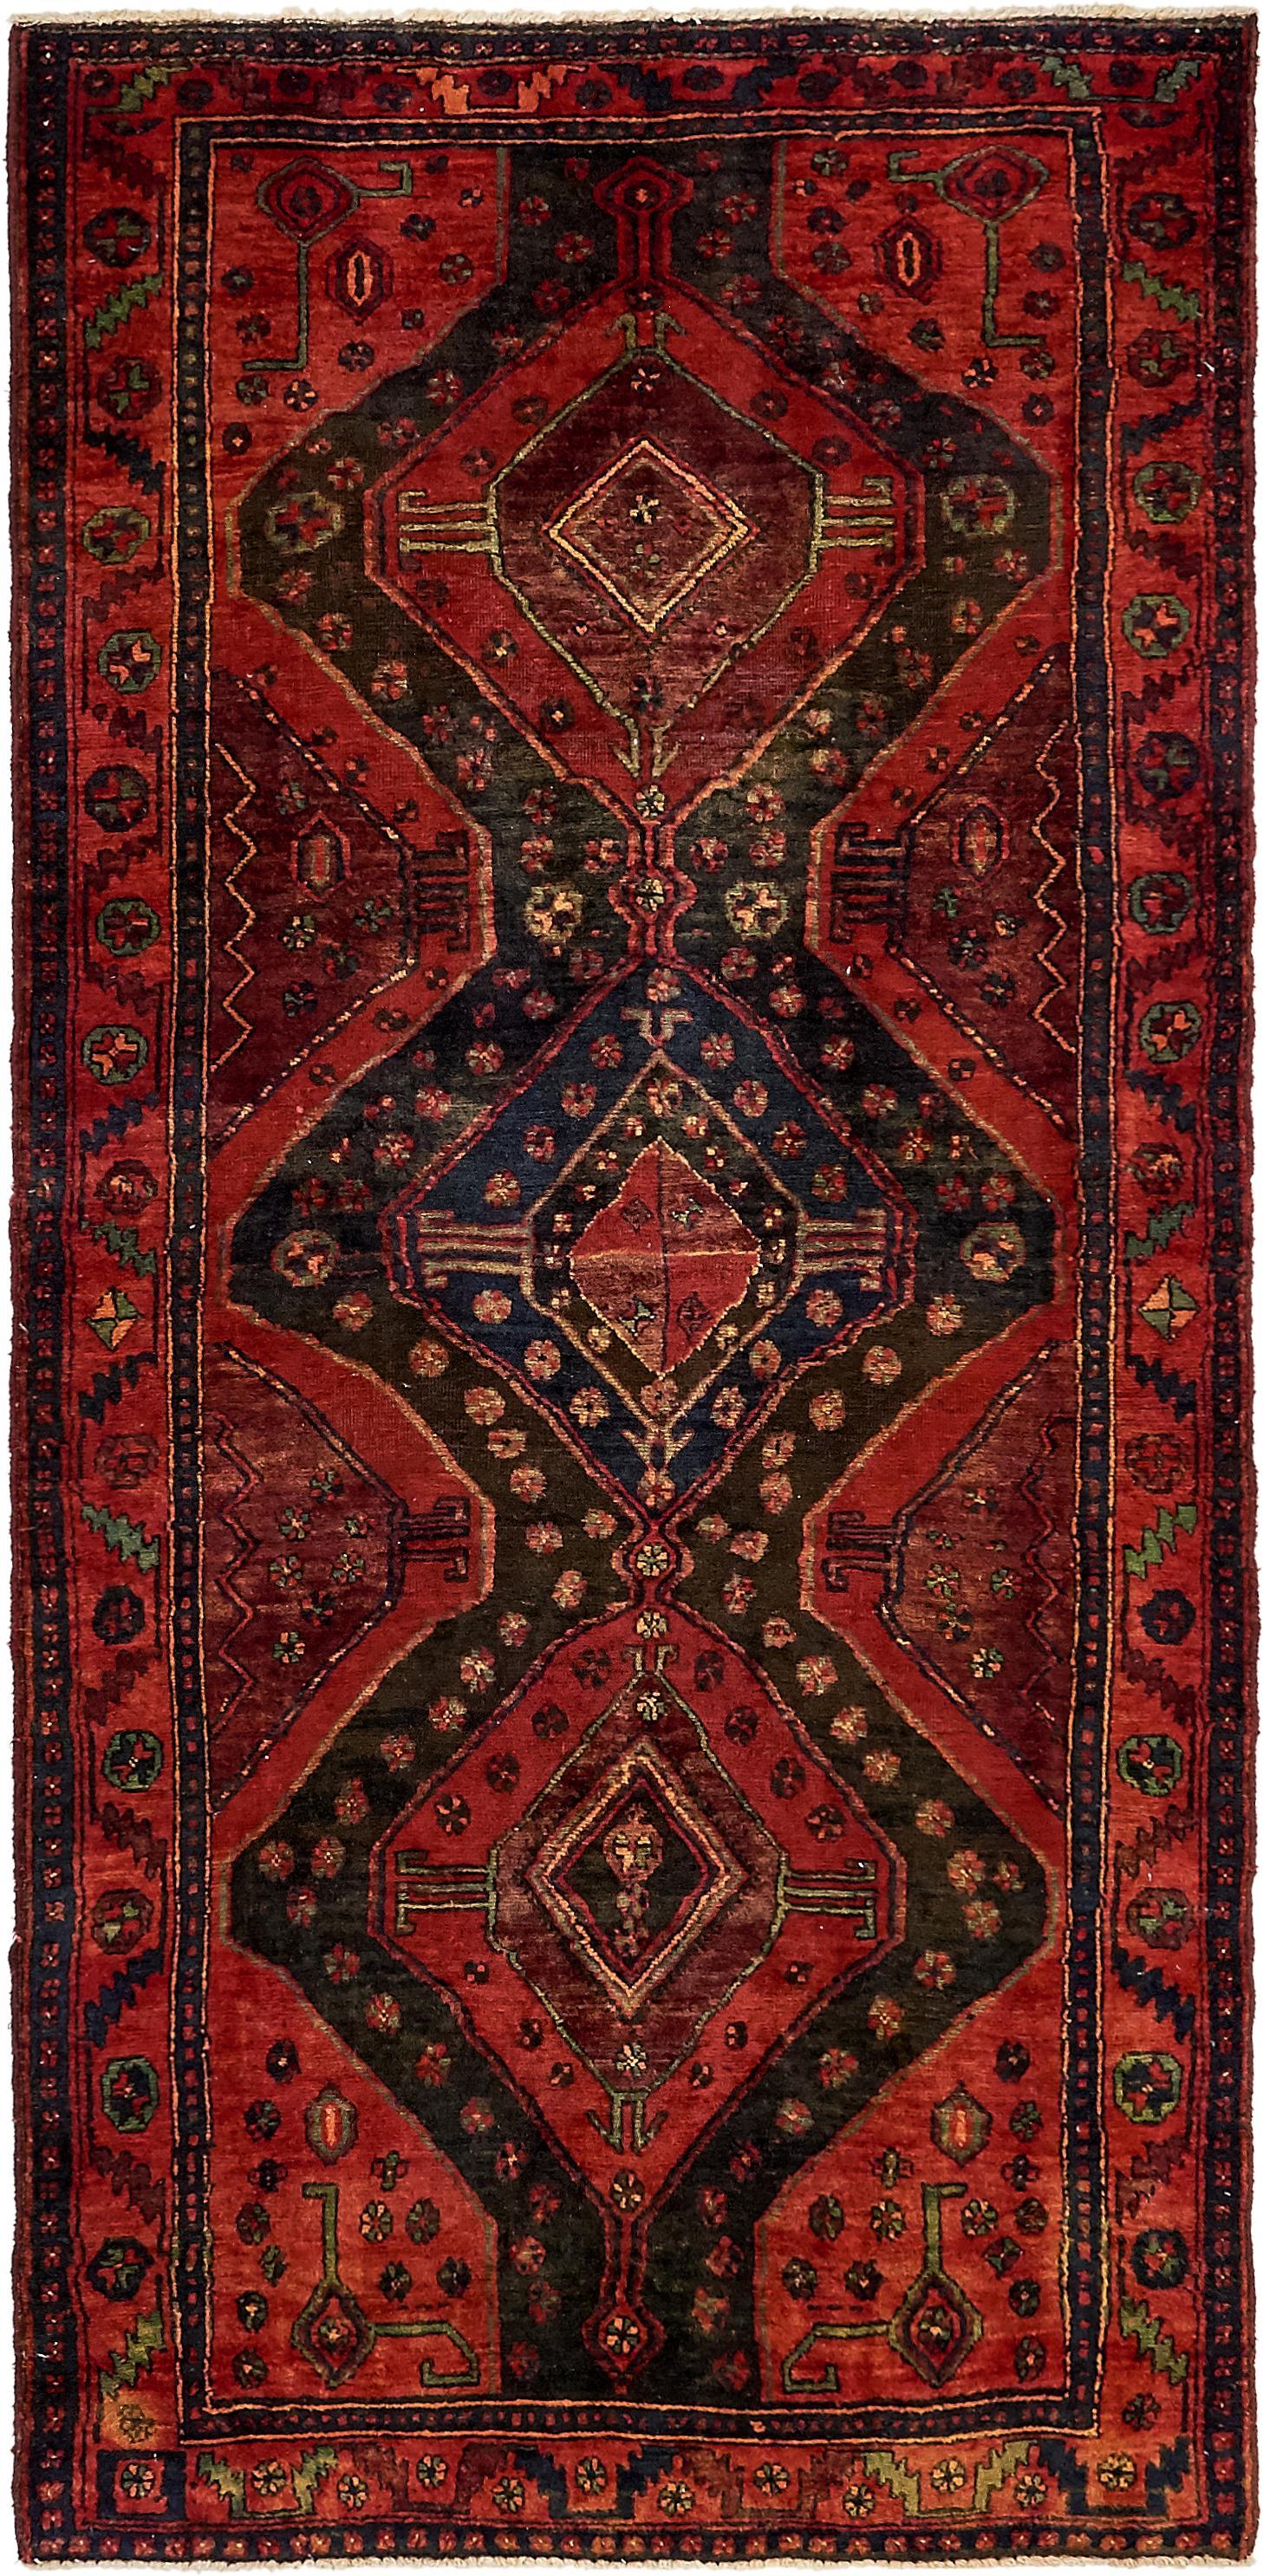 Red 3 10 X 8 1 Sirjan Persian Runner Rug Esalerugs